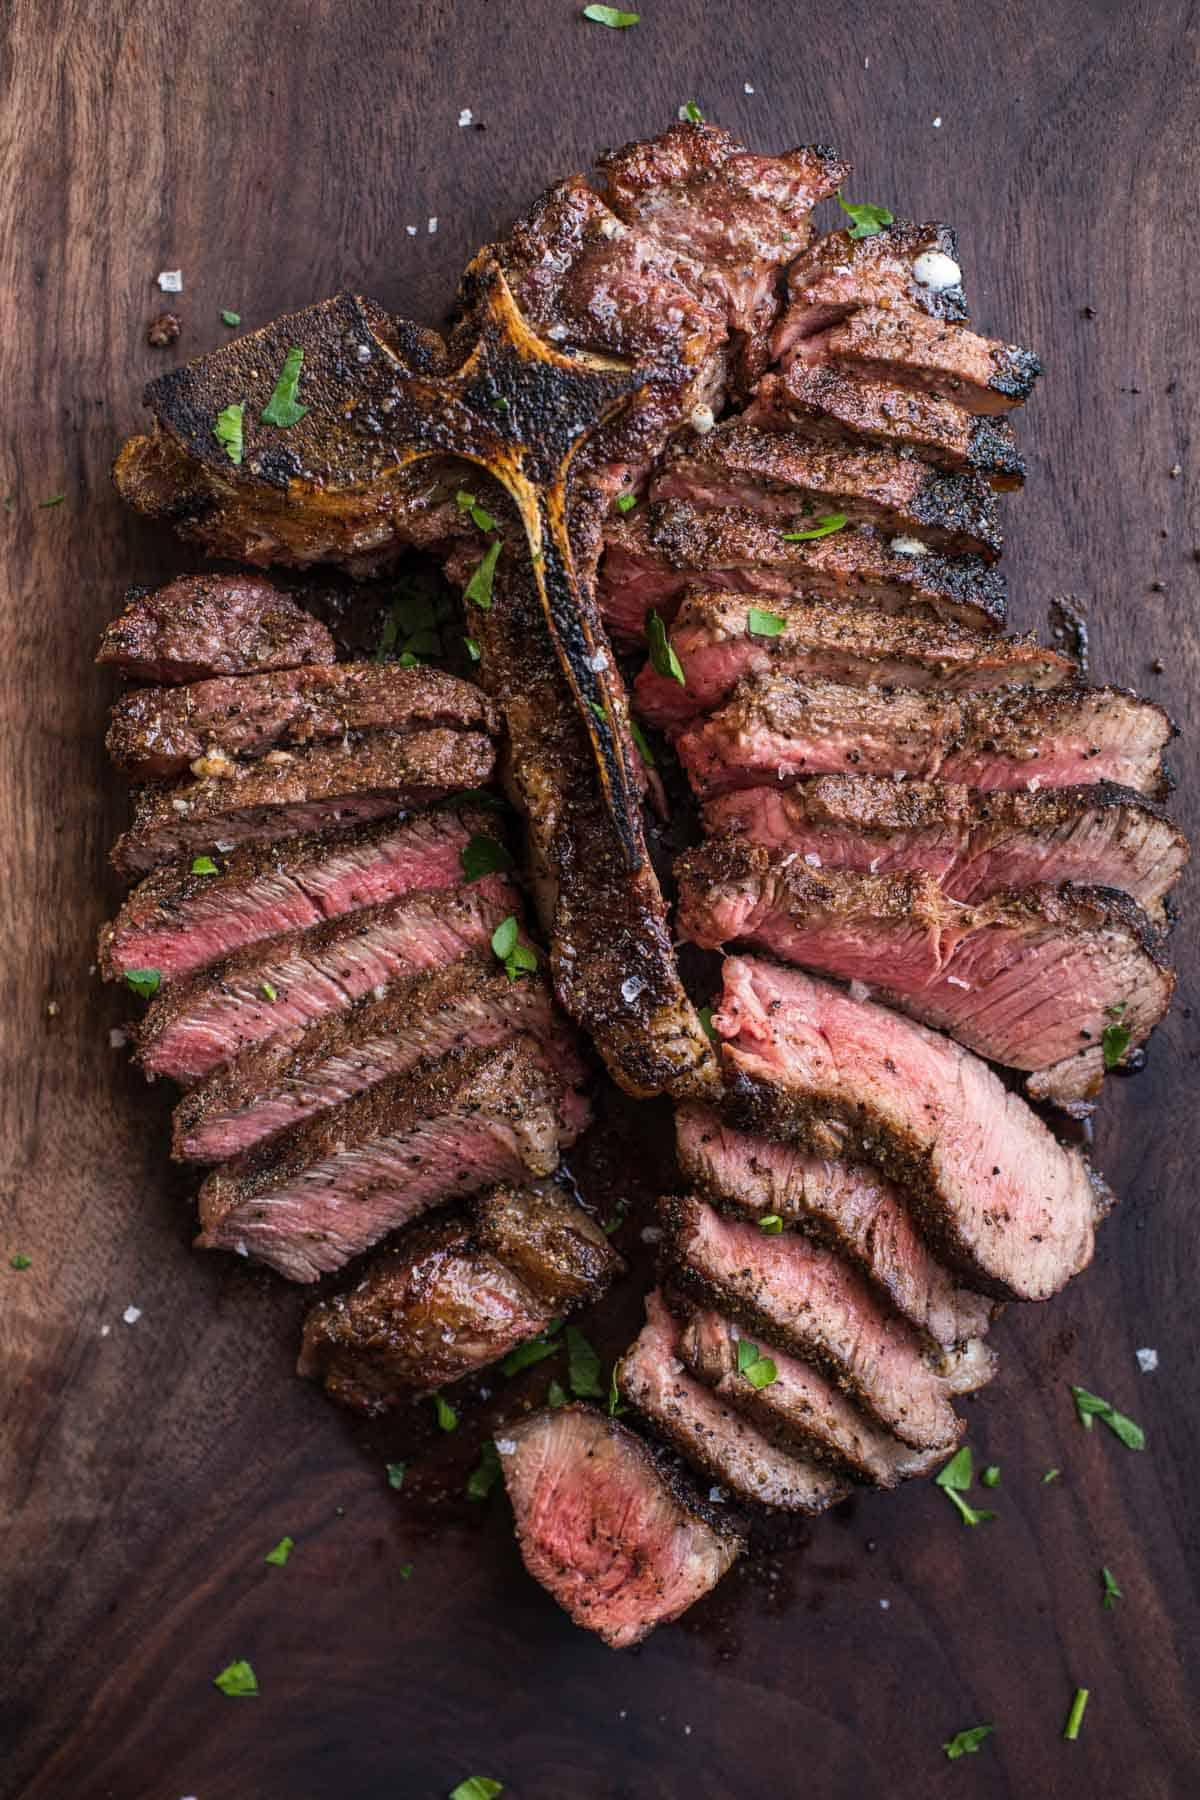 A Grilled Porterhouse Steak, sliced, on a wood cutting board